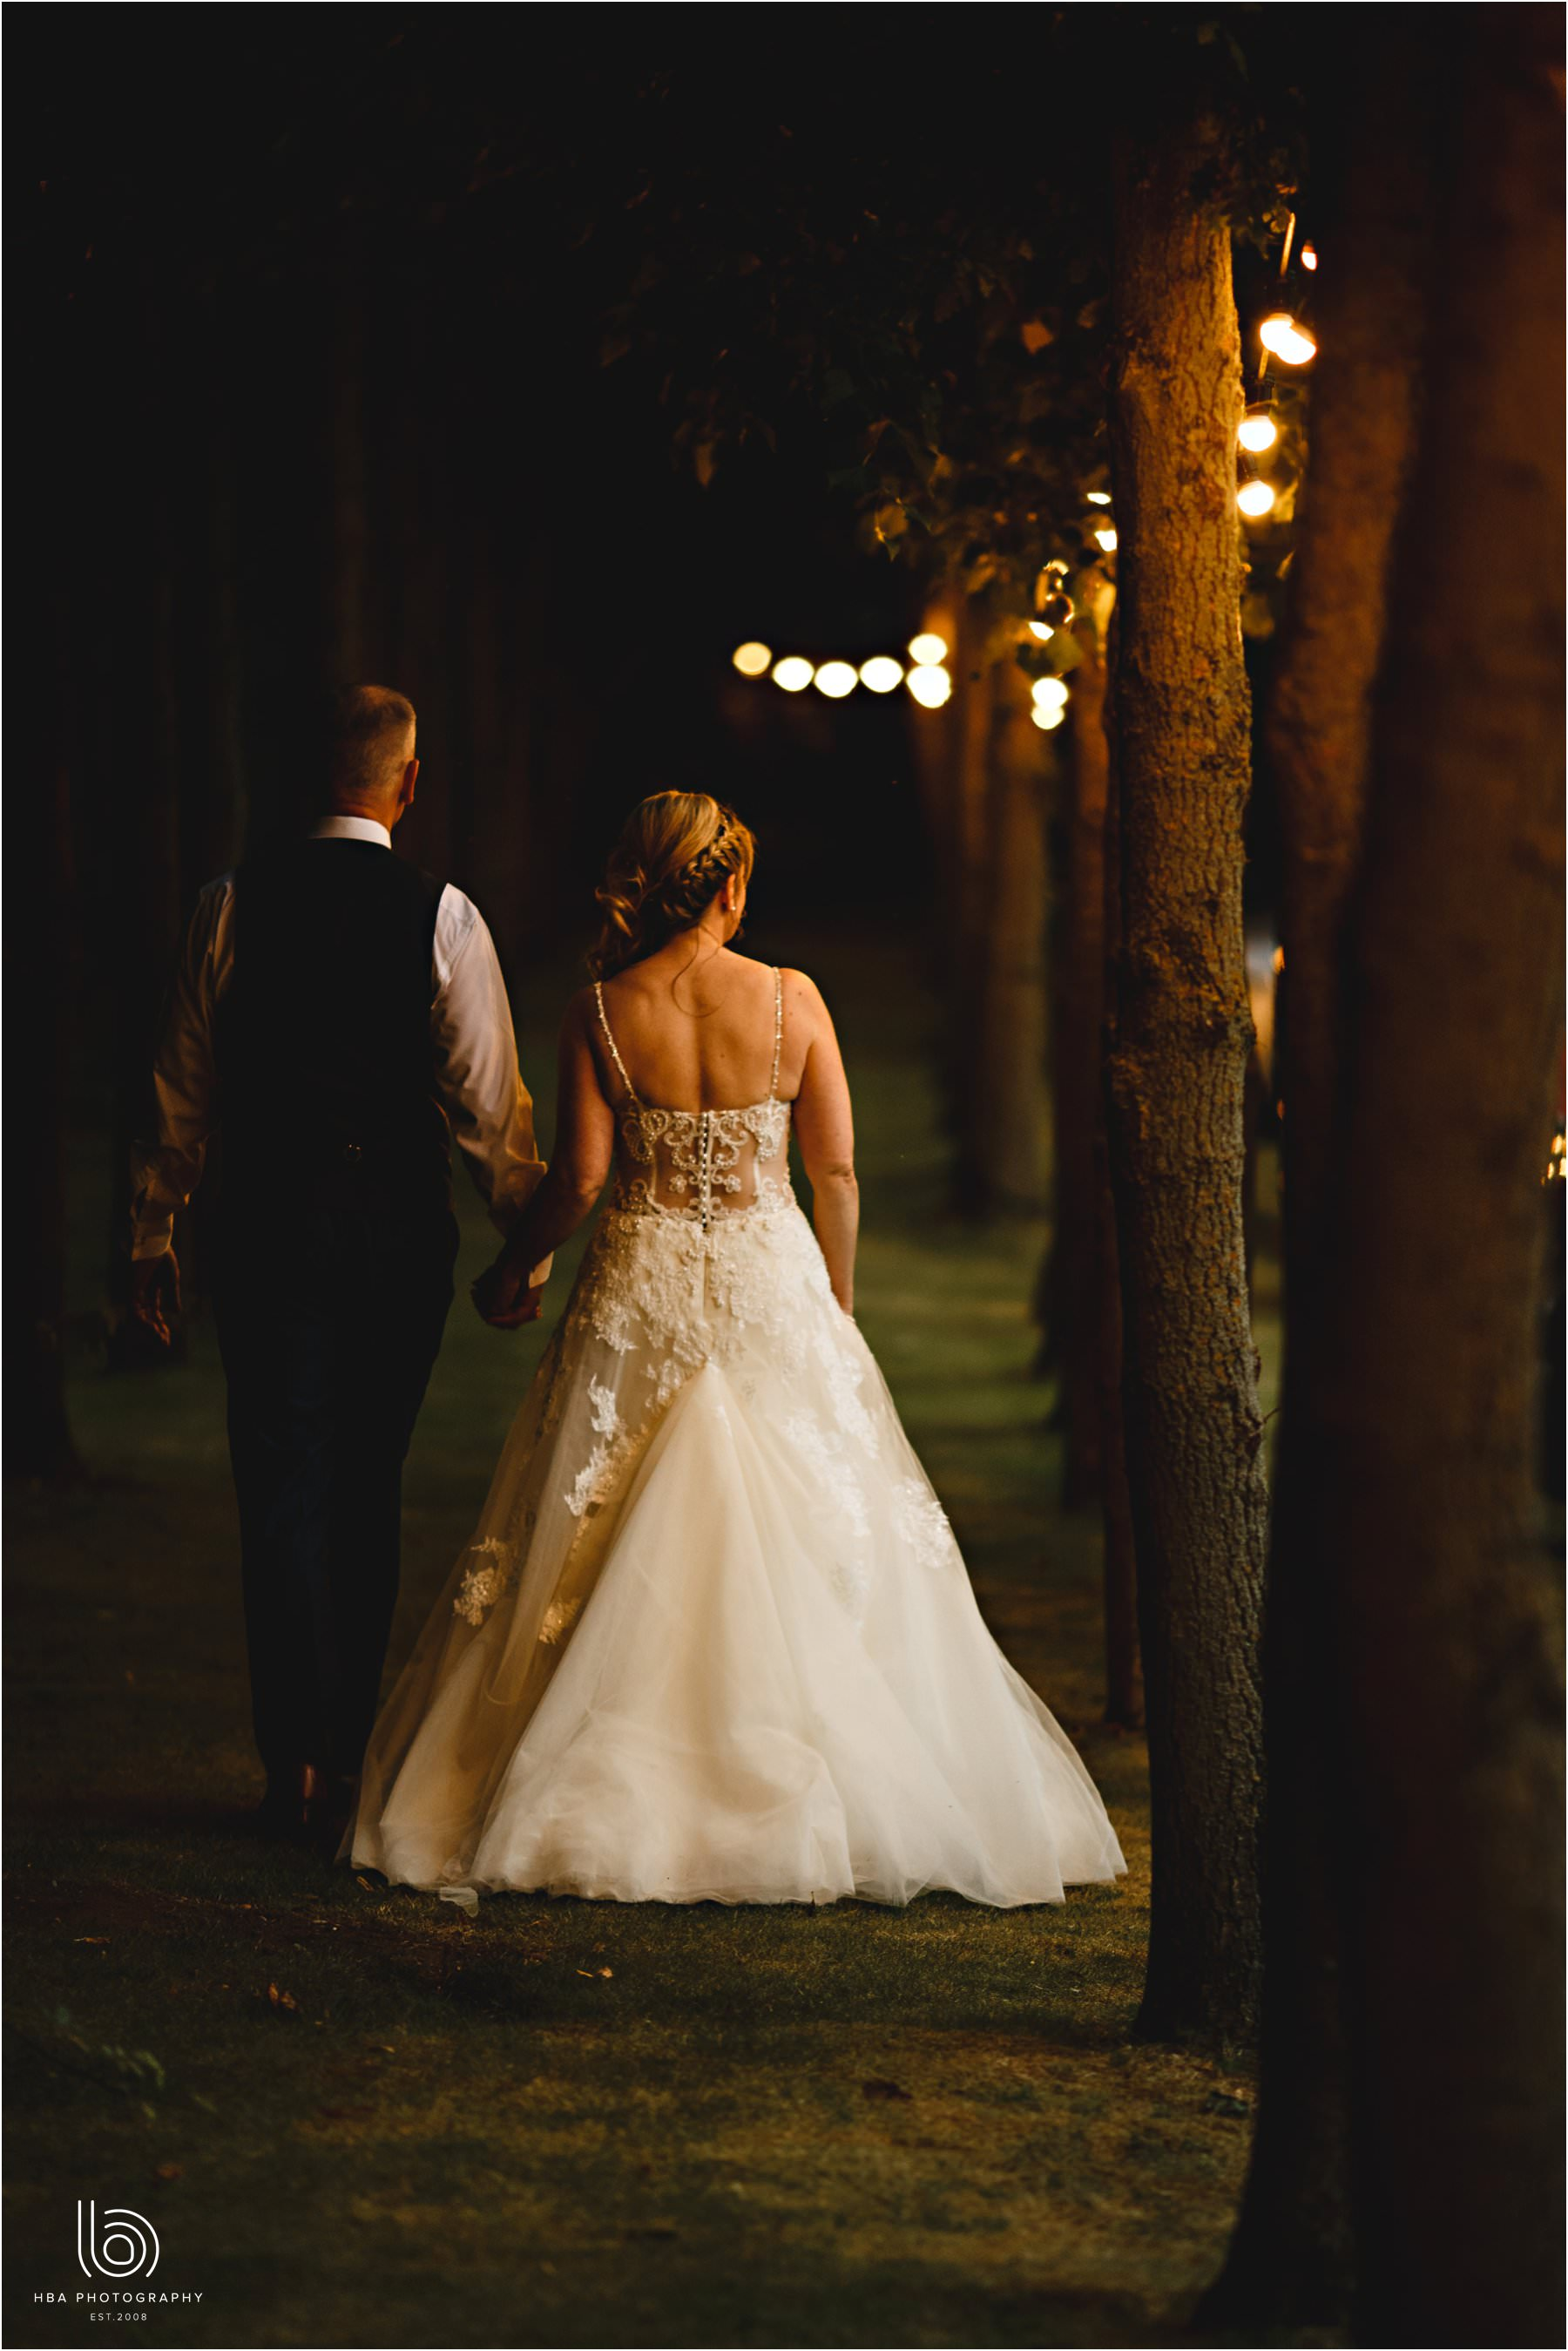 the bride & groom walking through the festoon lights